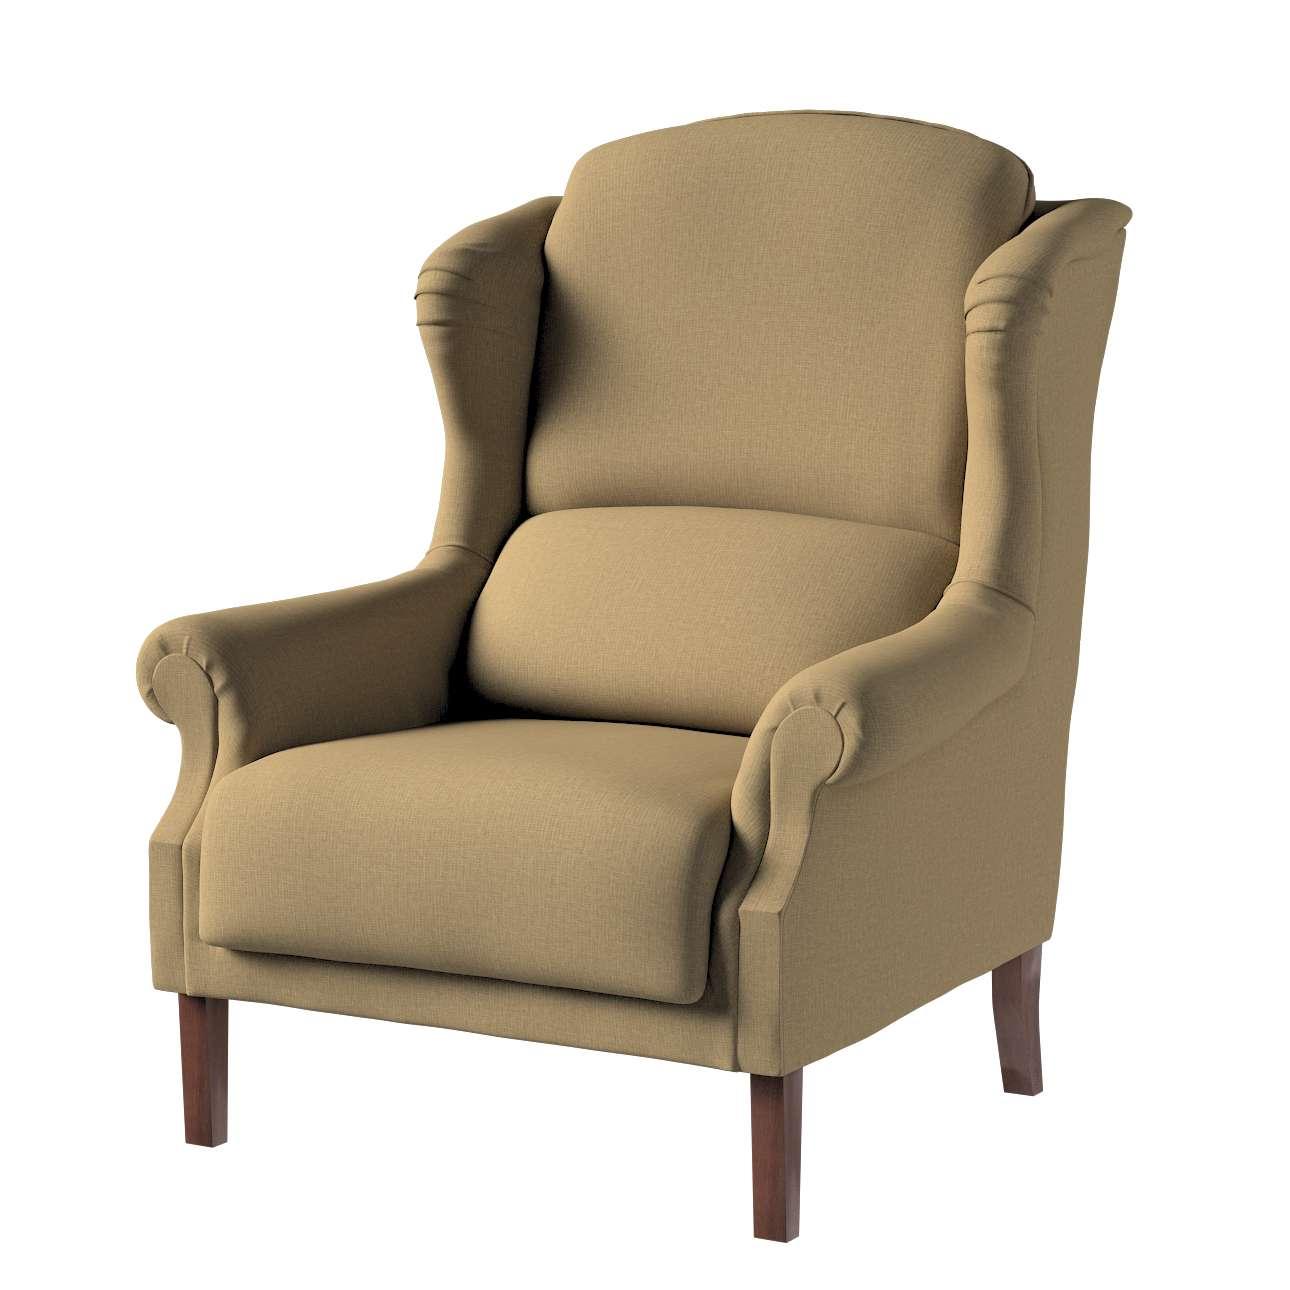 Fotel Unique w kolekcji Living, tkanina: 161-50